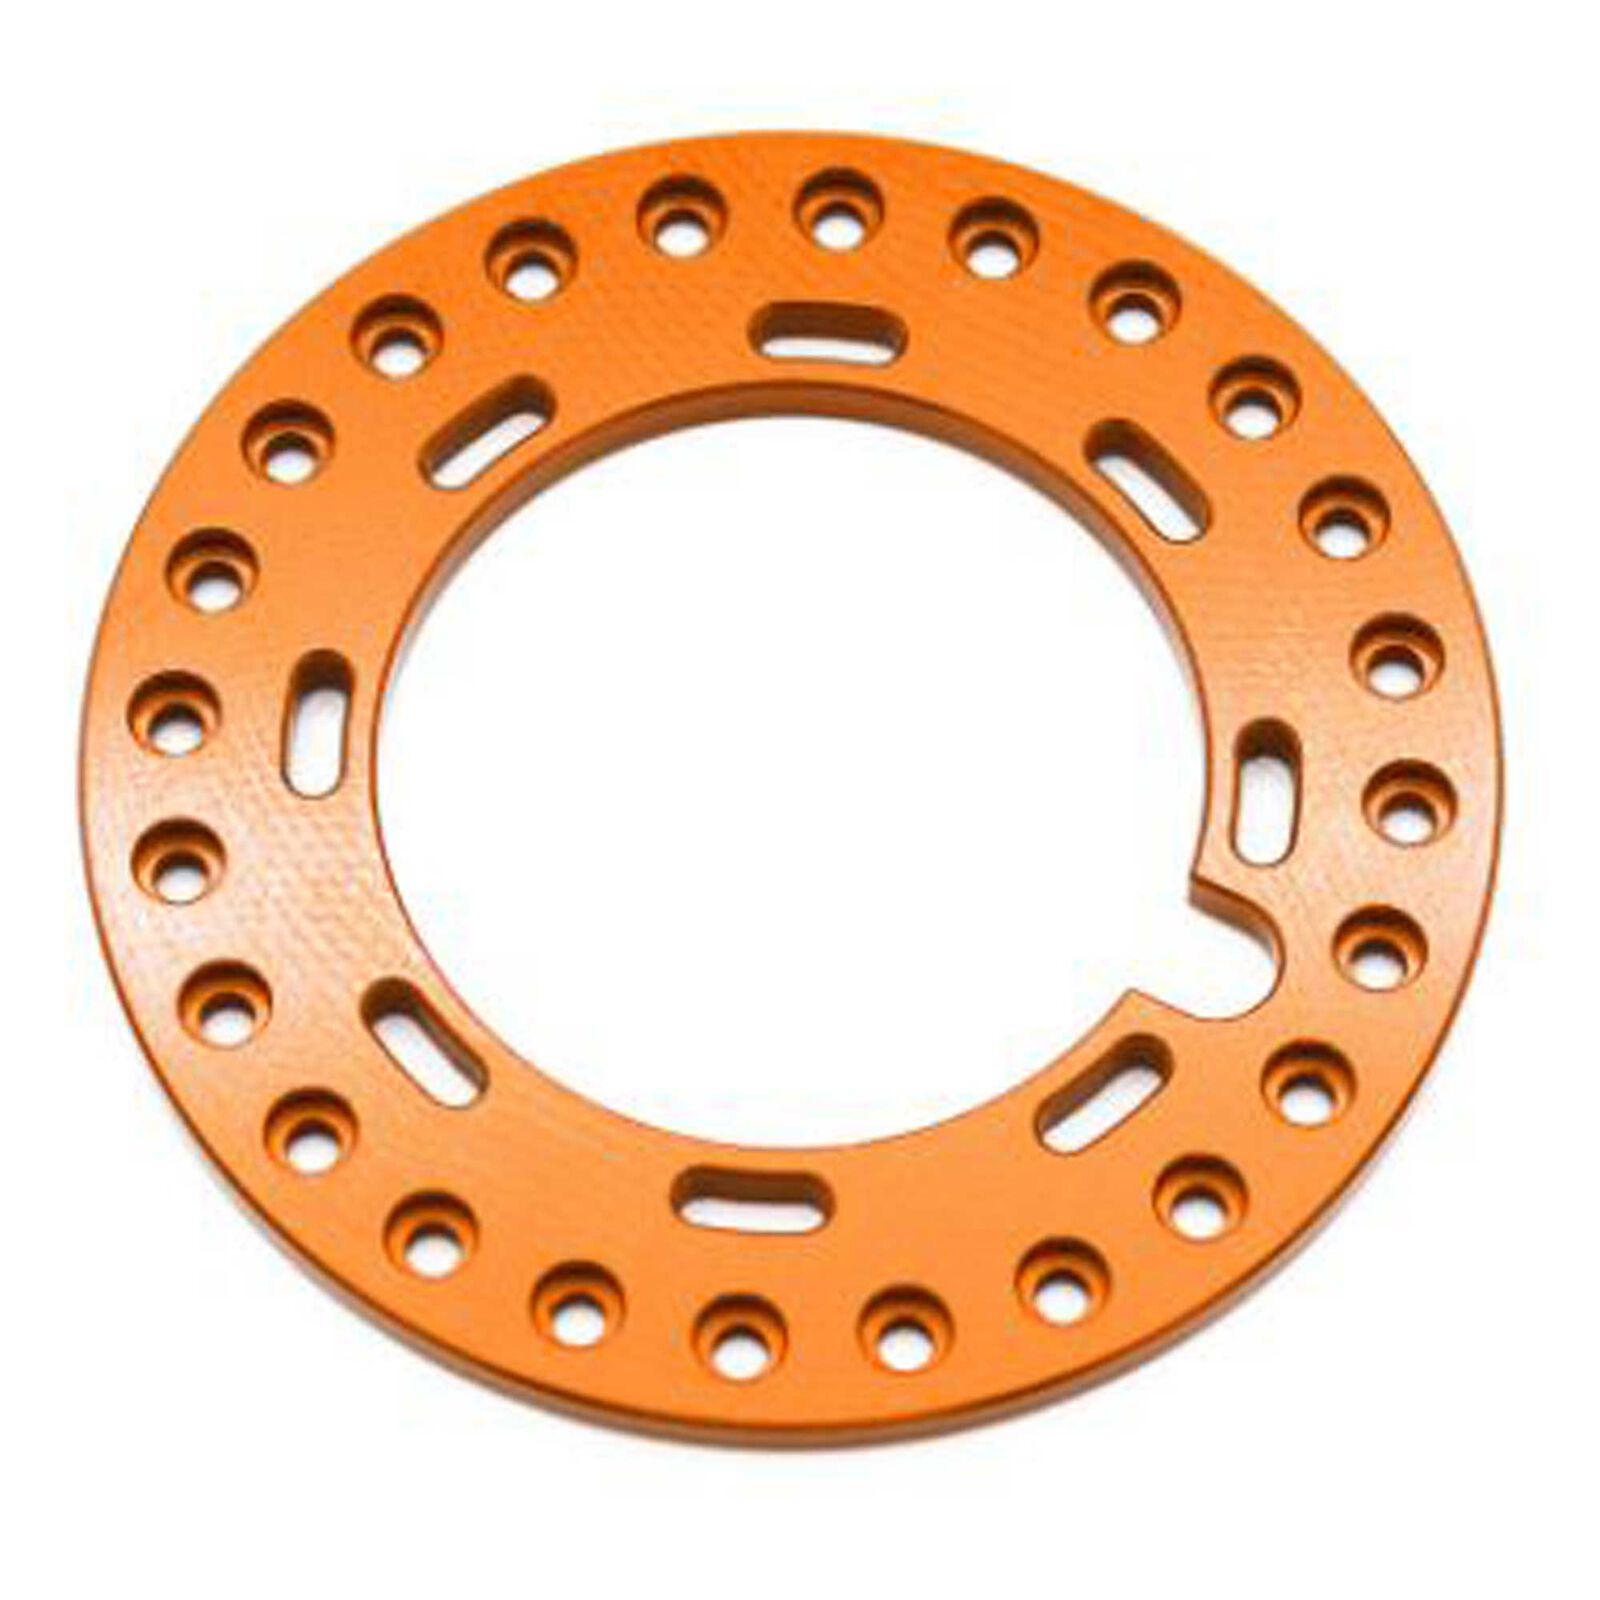 1.9 IBTR Beadlock Orange Anodized